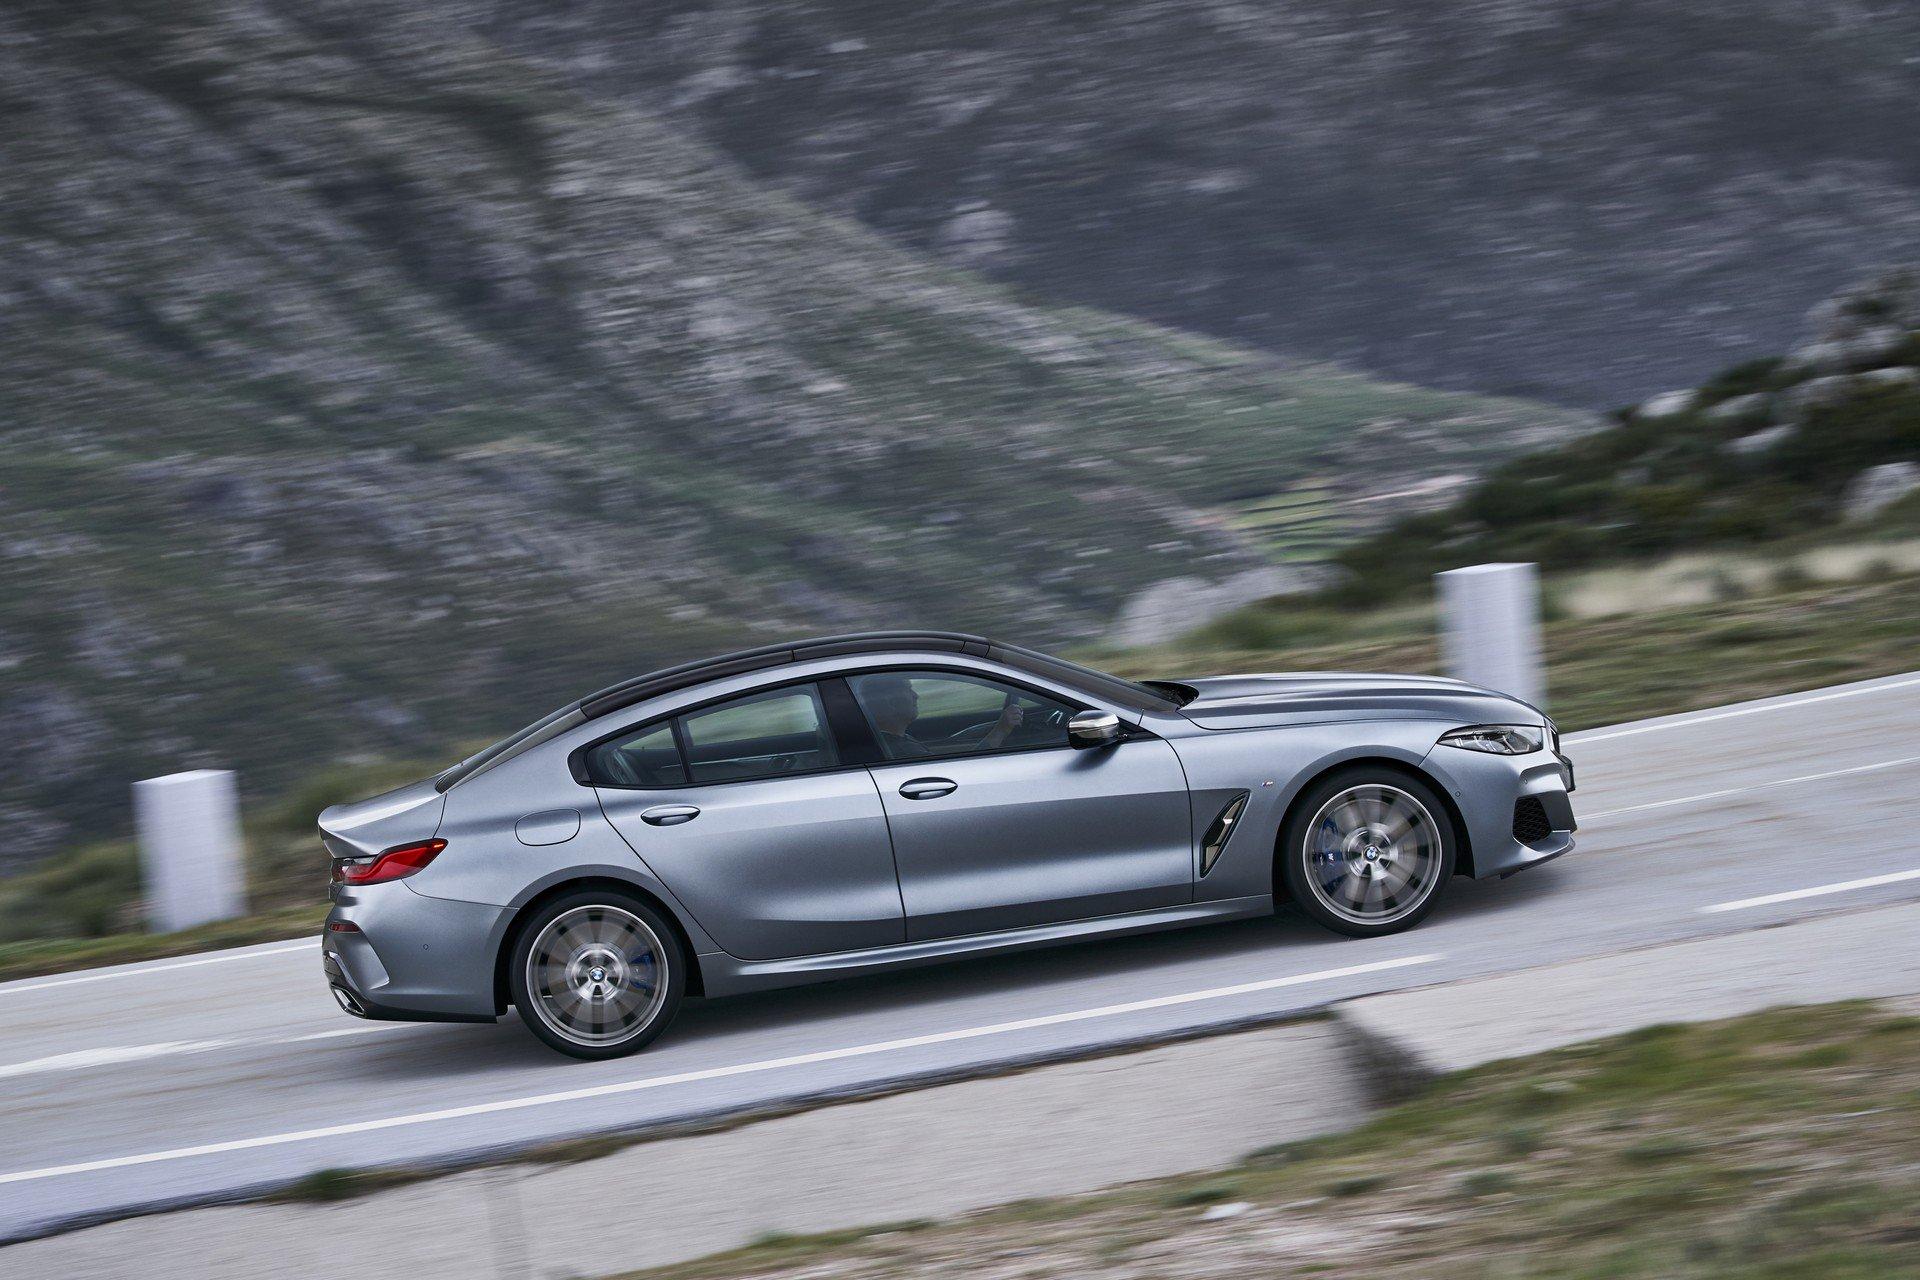 2020-bmw-8-series-gran-coupe-18.jpg